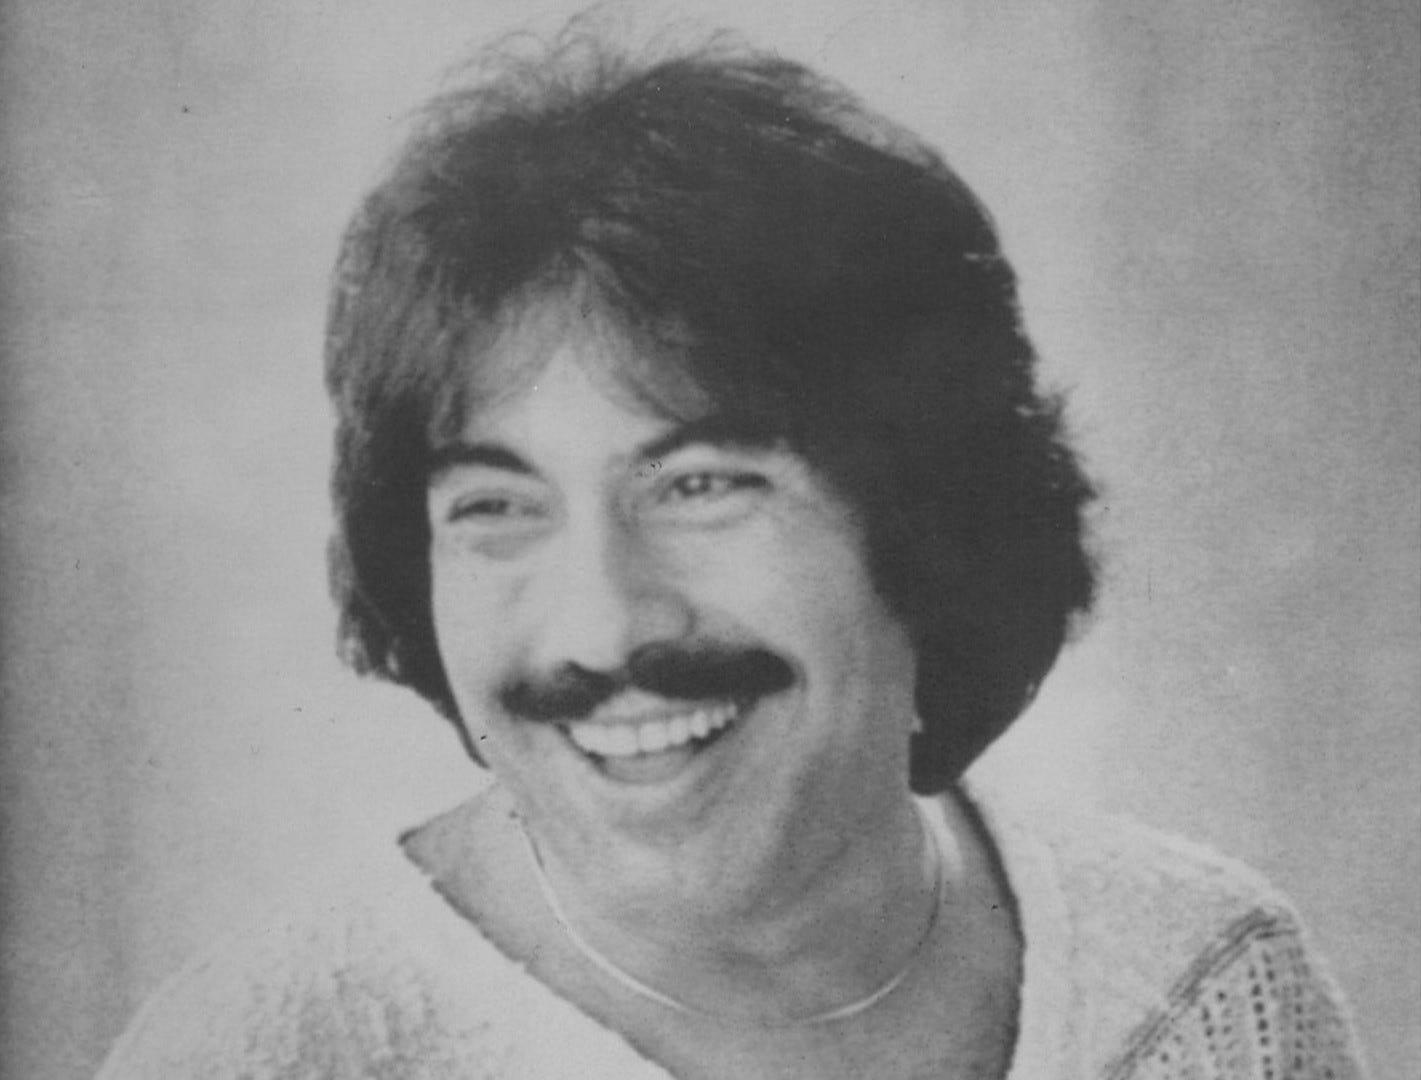 Tony Orlando is seen in 1977.